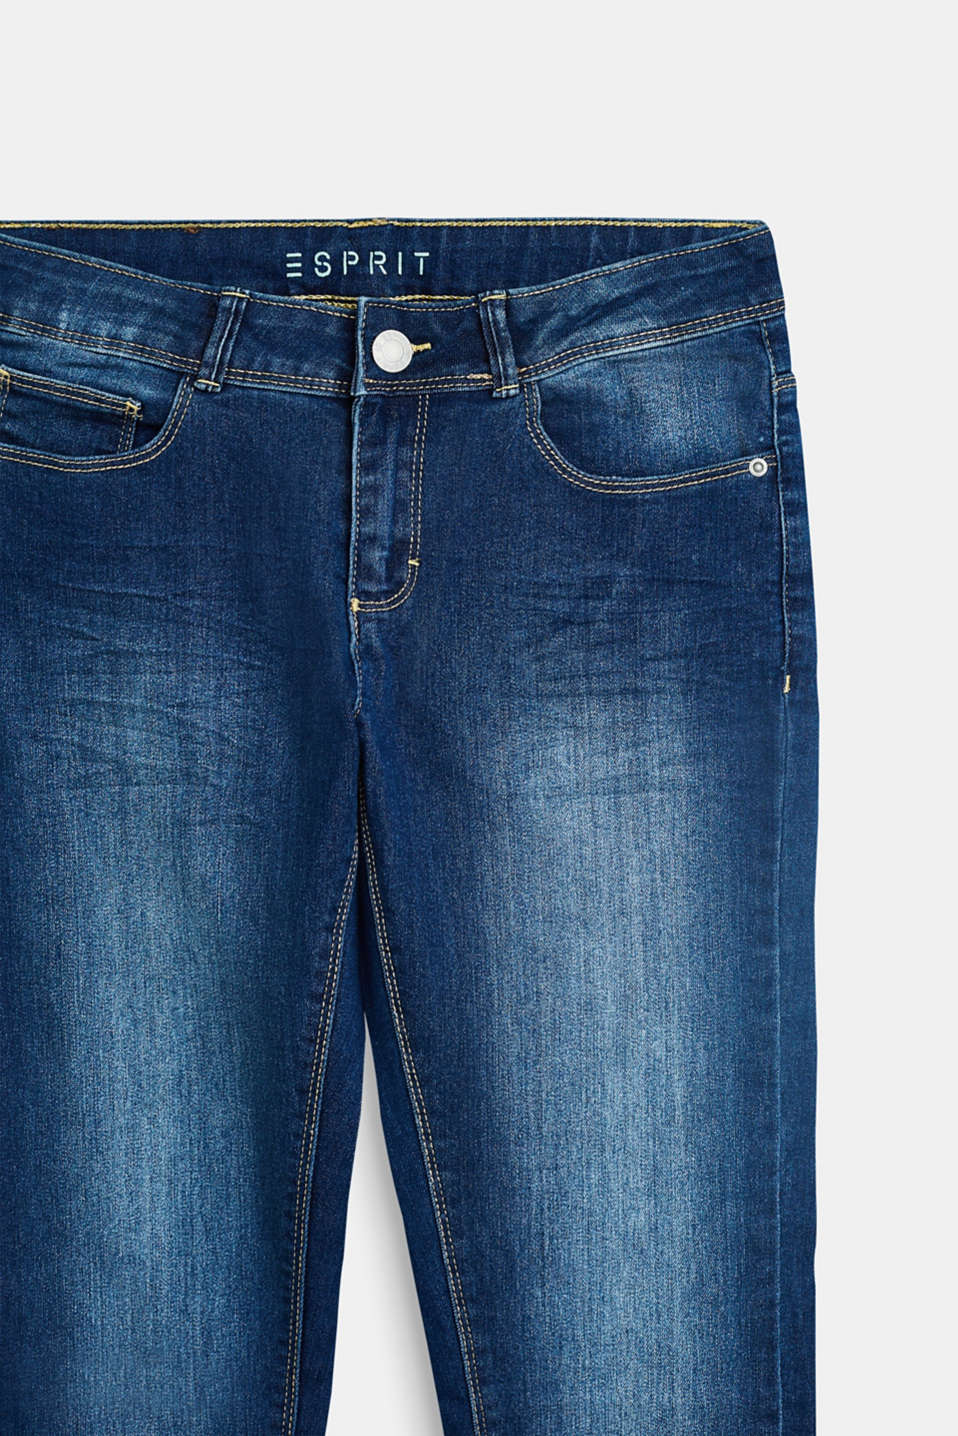 Stretch jeans with an adjustable waist, LCDARK INDIGO DE, detail image number 2